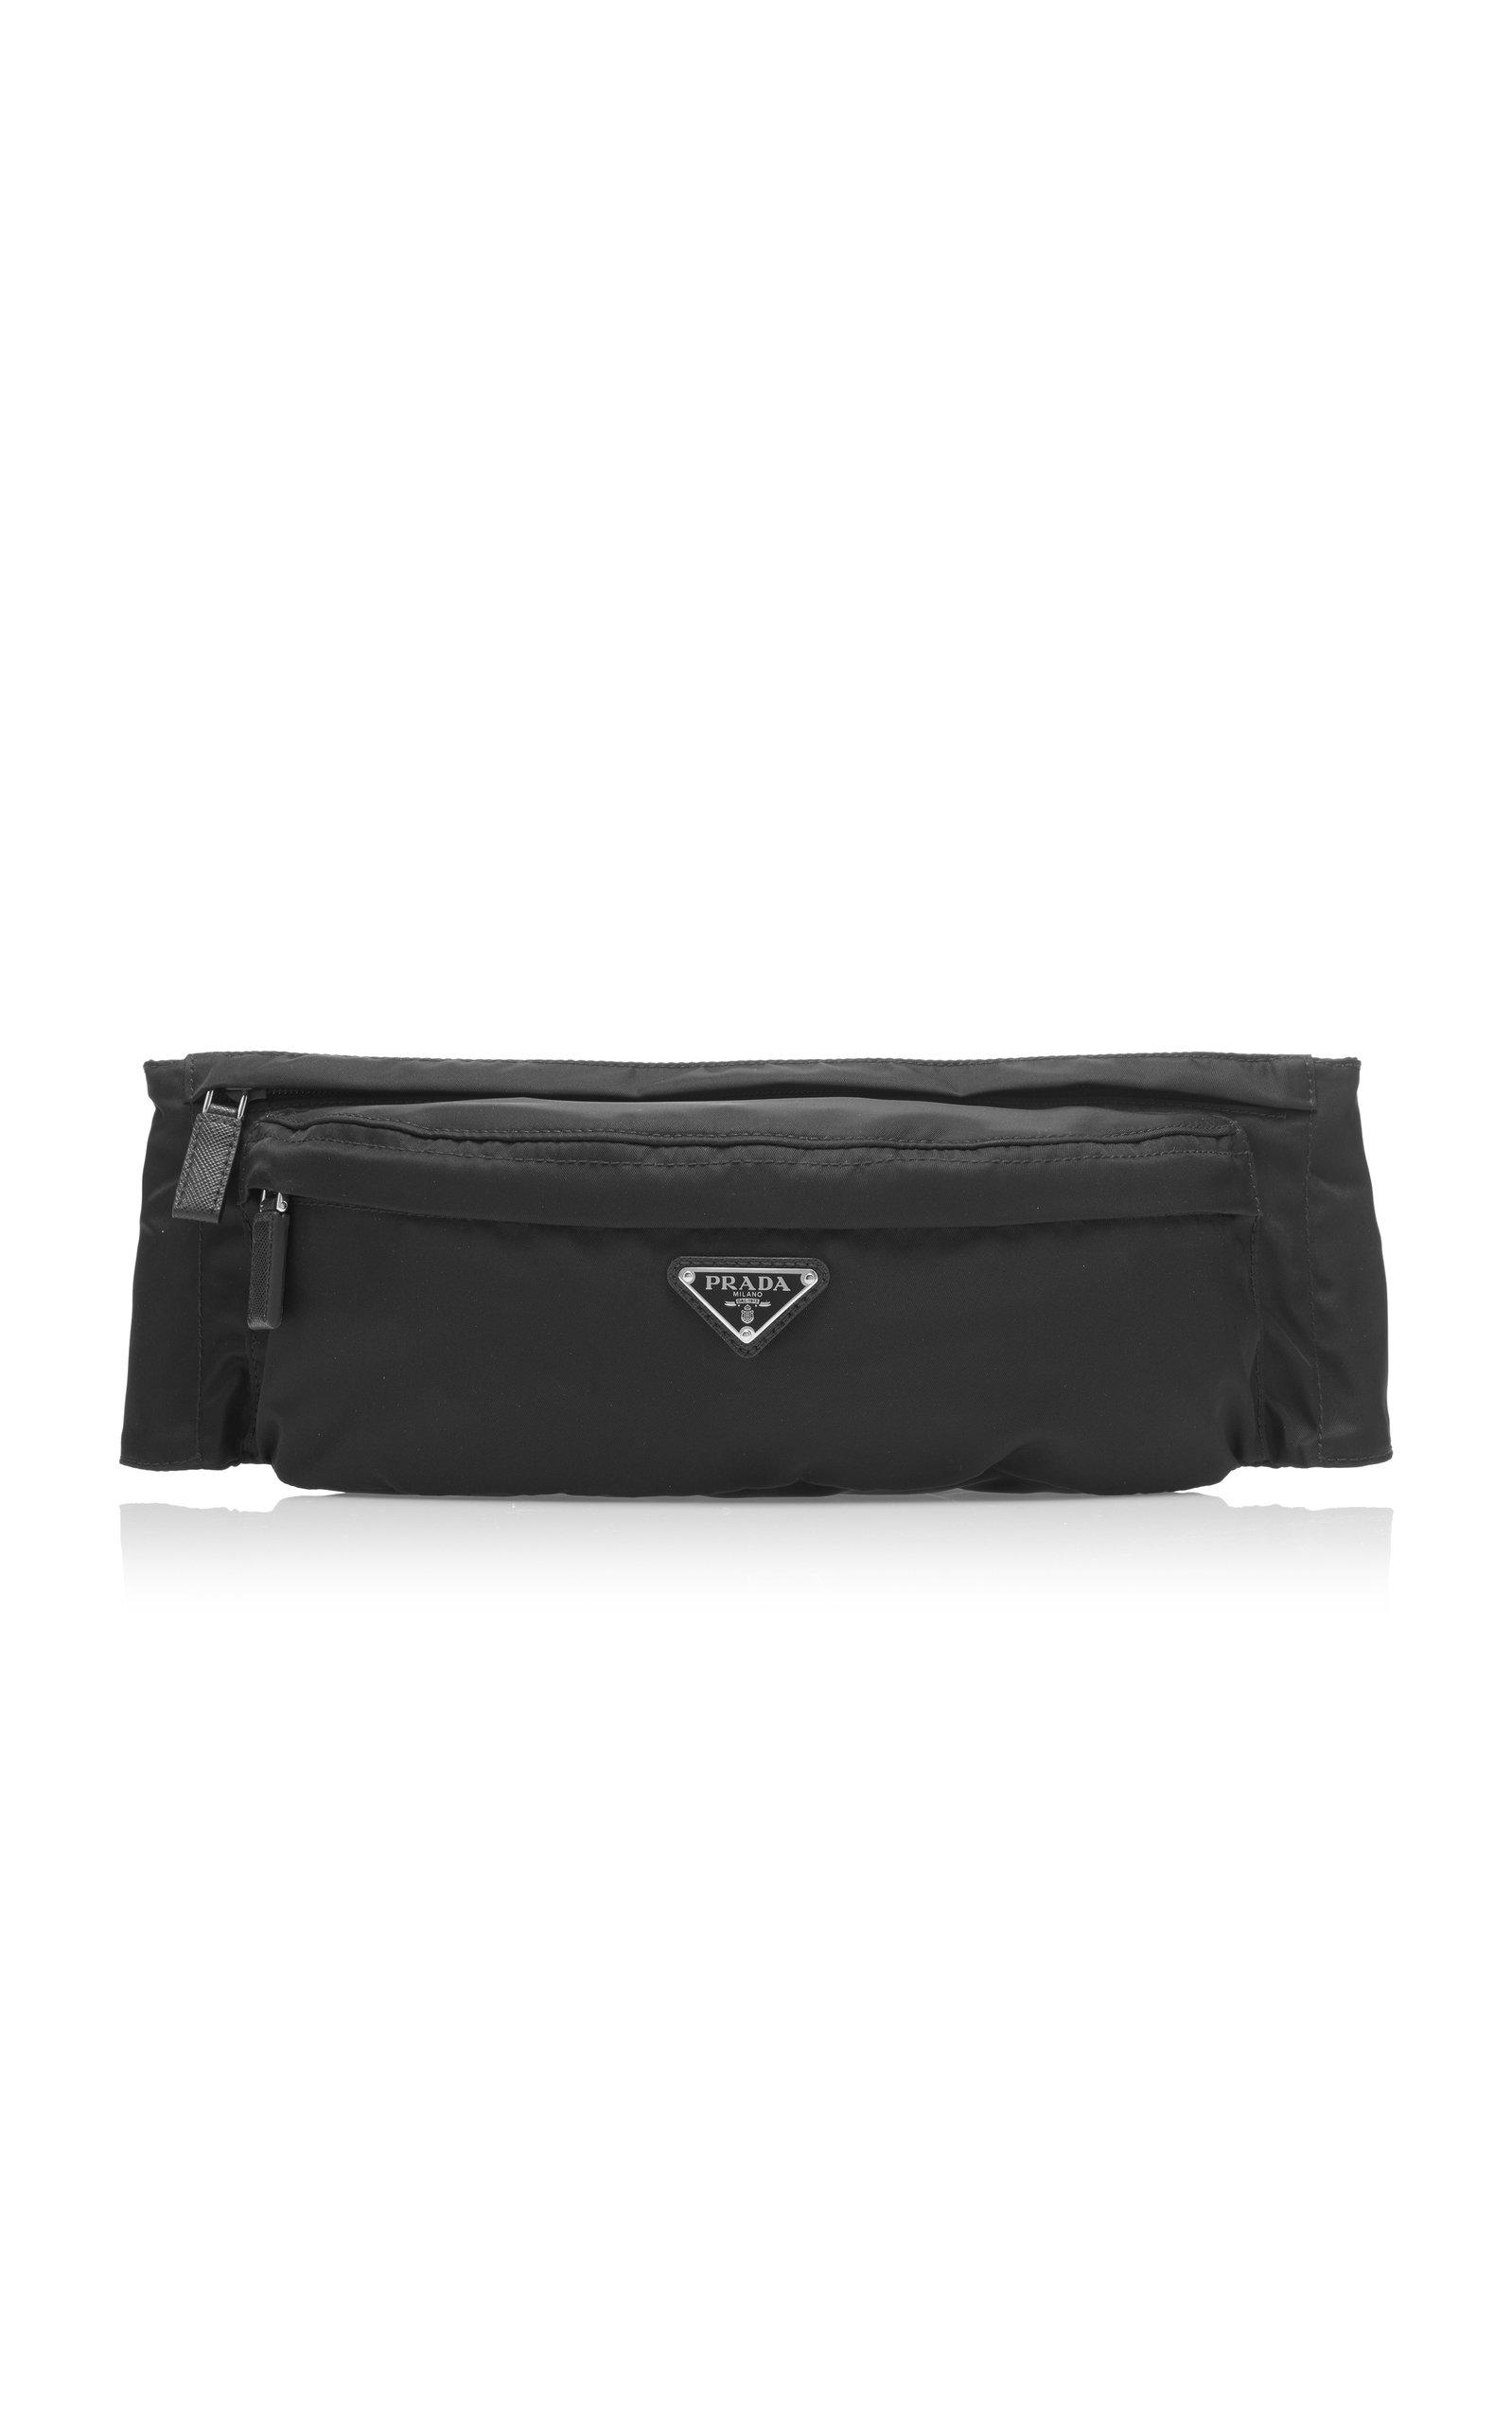 Prada Tessuto Waist Pack - Black In F0002